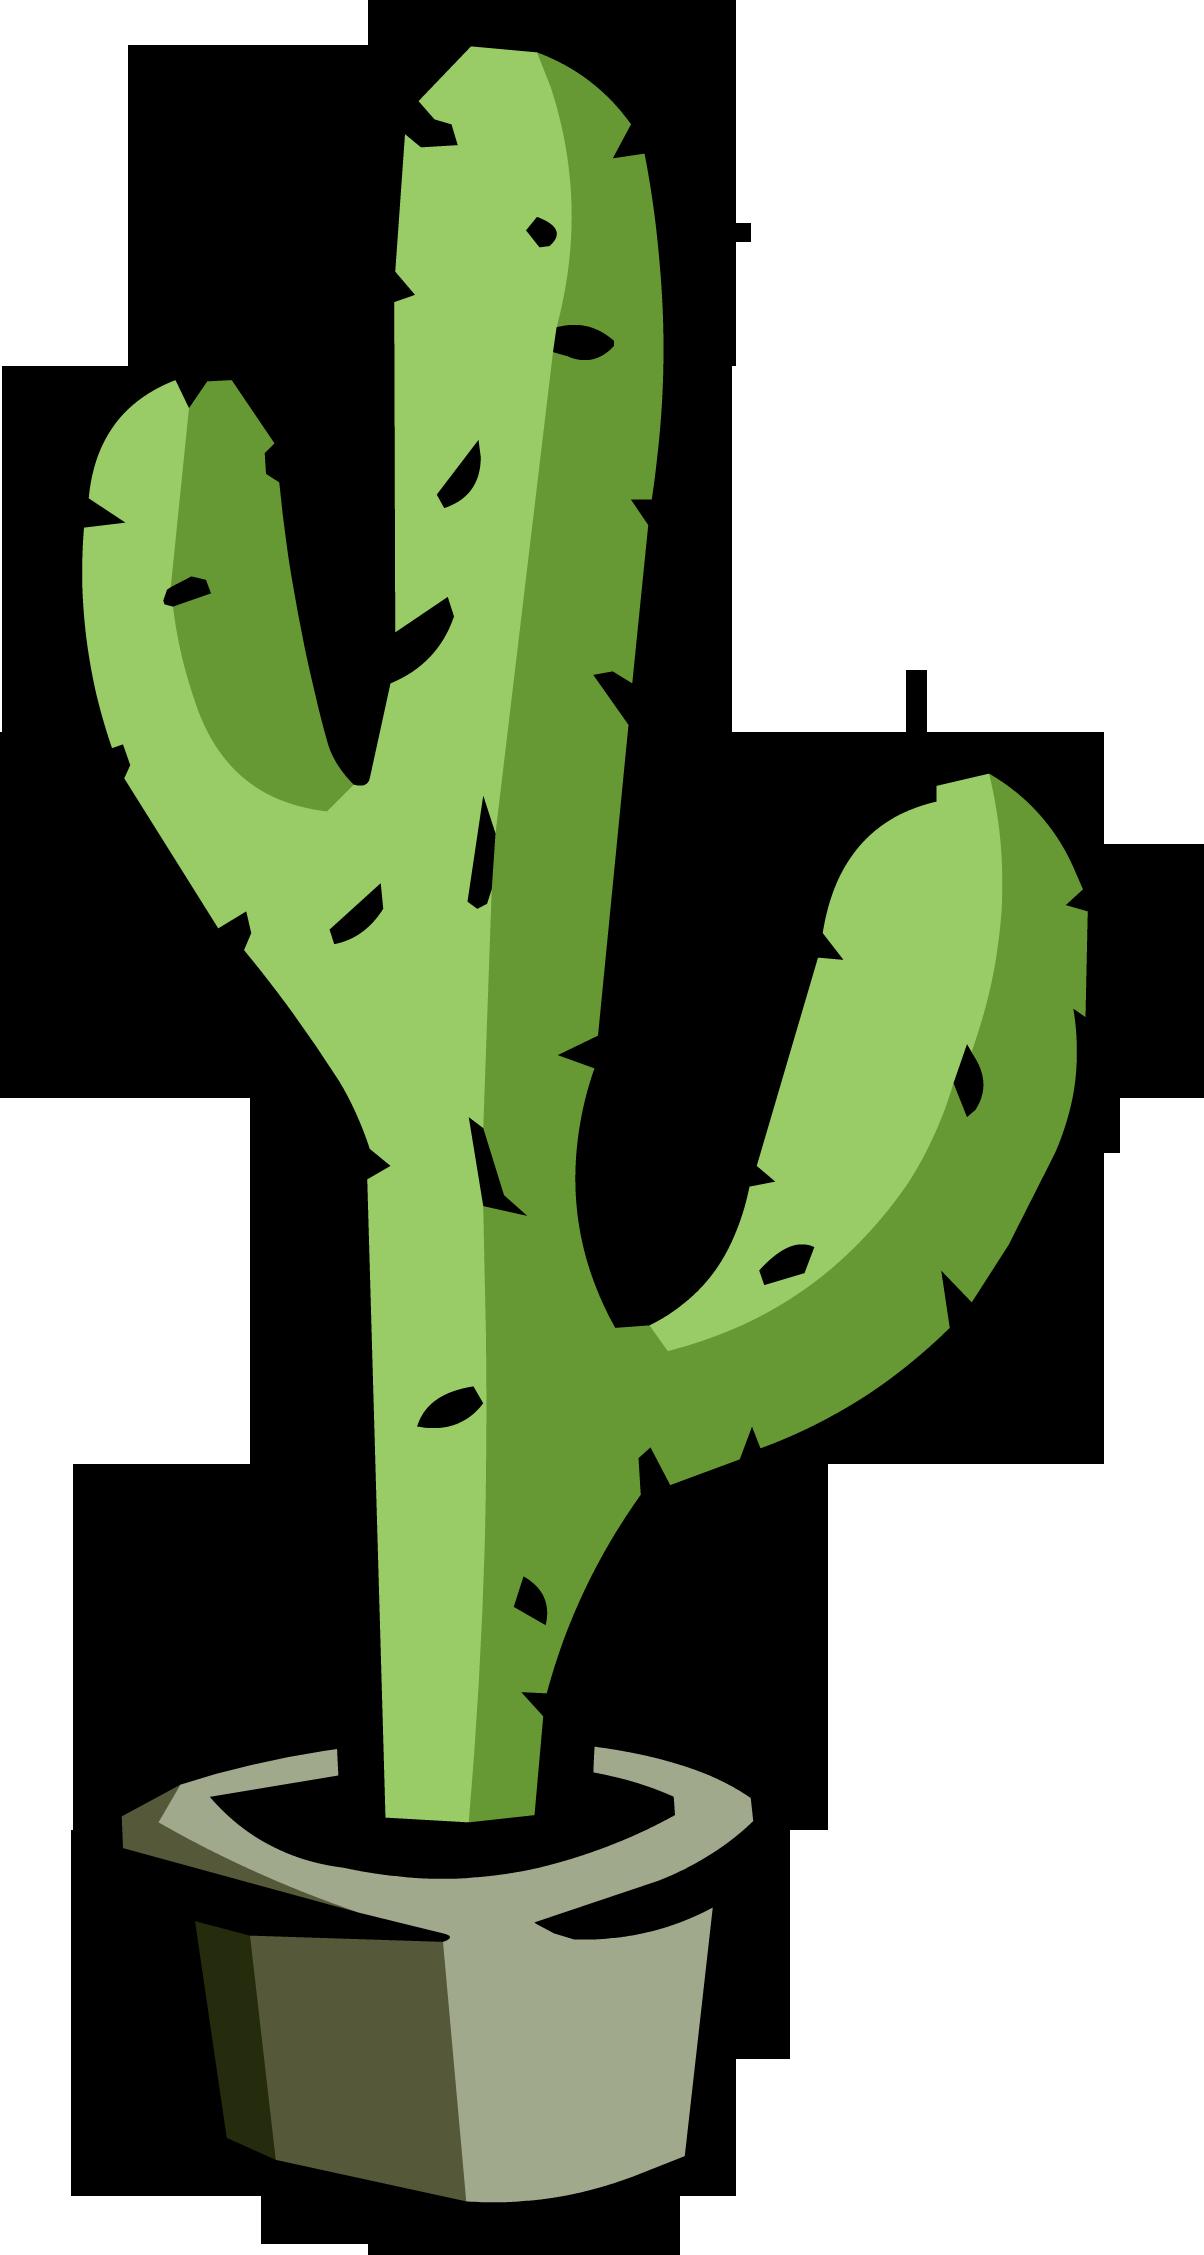 Transparent nopales clipart banner freeuse library Cactus PNG Transparent Cactus.PNG Images. | PlusPNG banner freeuse library